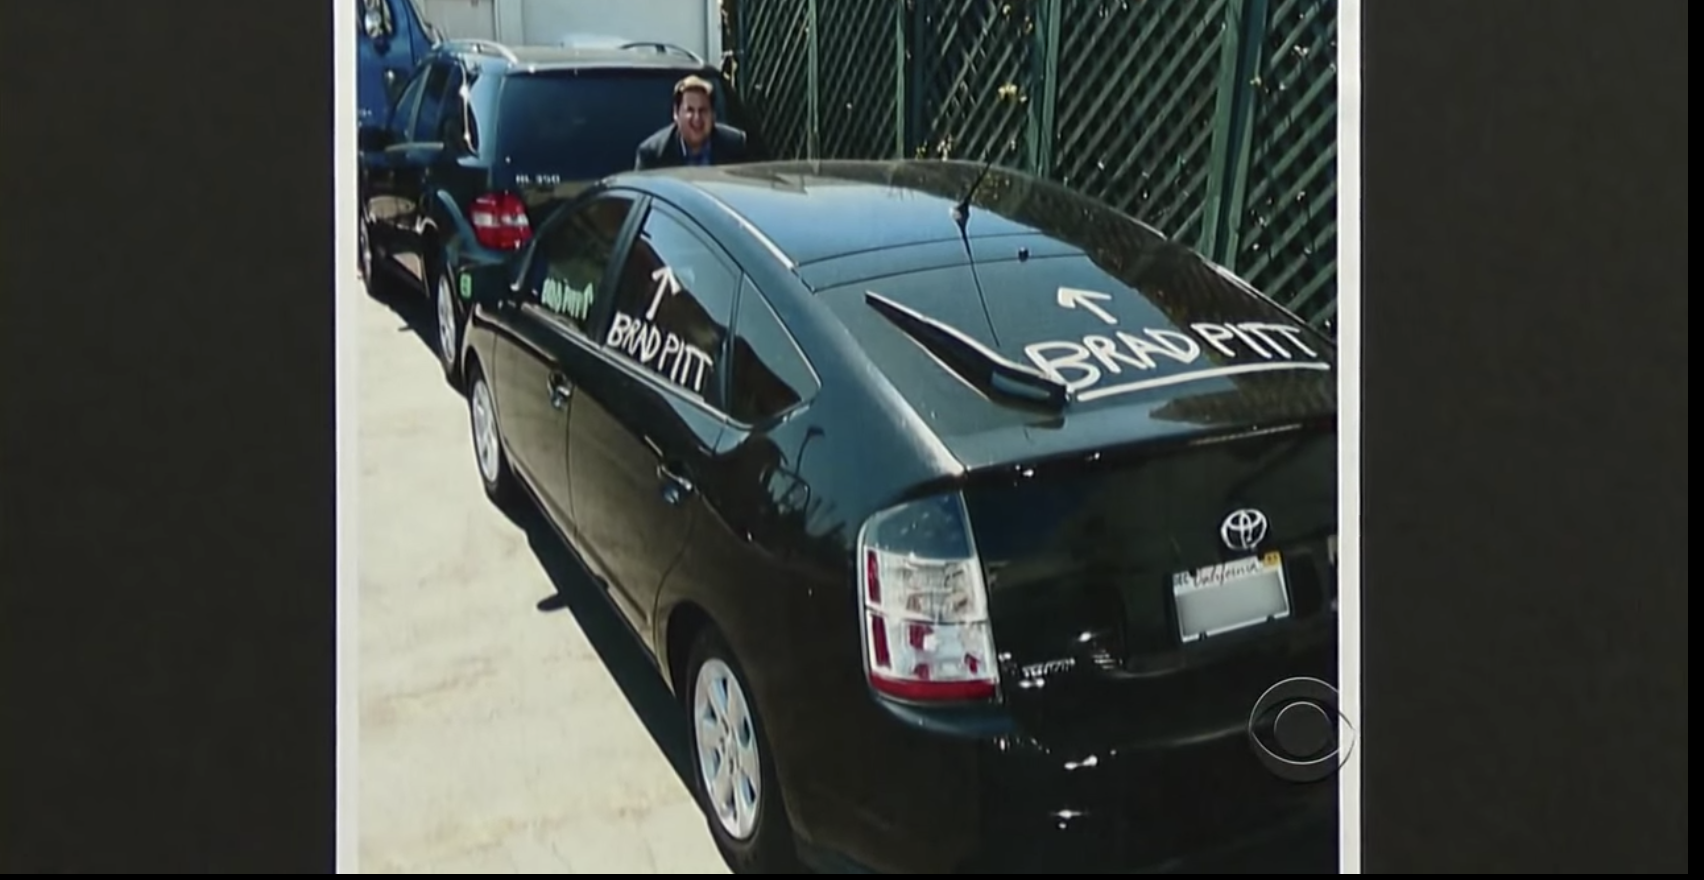 "Jonah Hill paints Brad Pitt's car with arrows pointing that say ""Brad Pitt"""